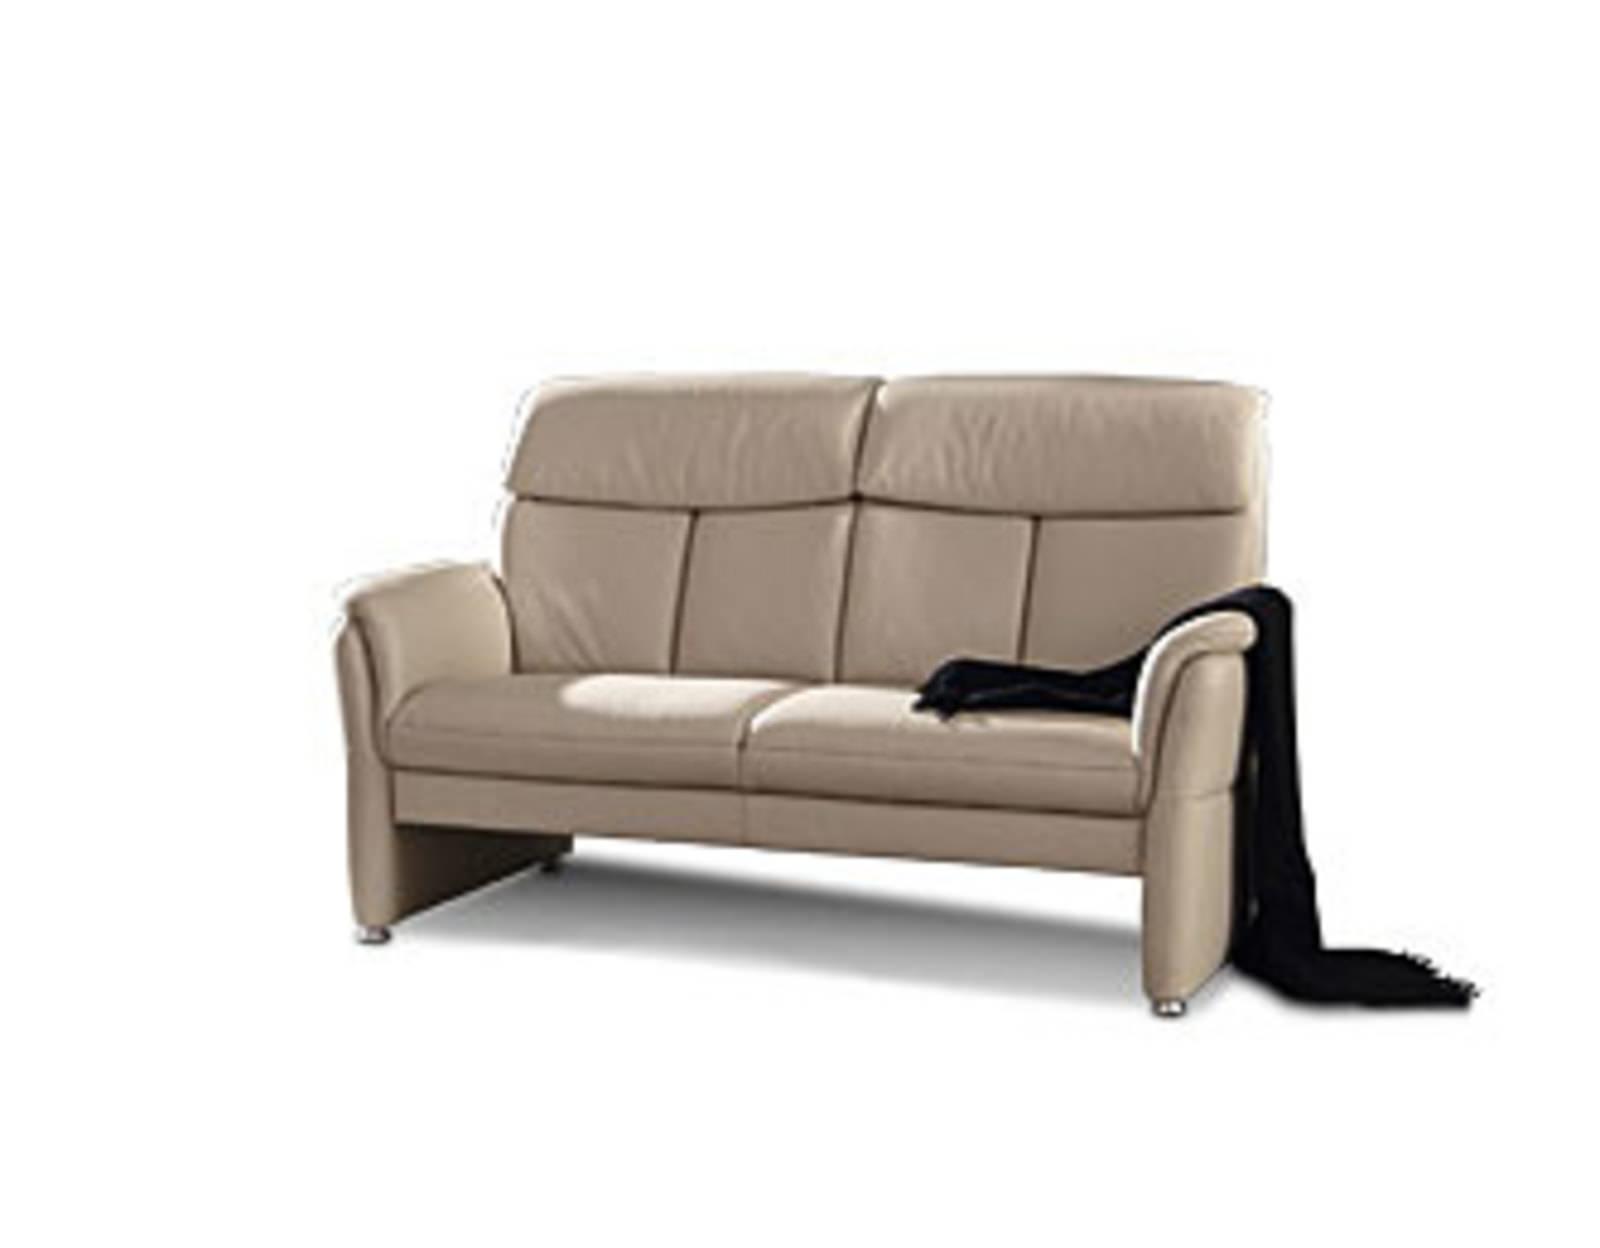 sofas 2 sitzer good muuto oslo sitzer dark grey with sofas 2 sitzer cool sofa oxford sitzer. Black Bedroom Furniture Sets. Home Design Ideas